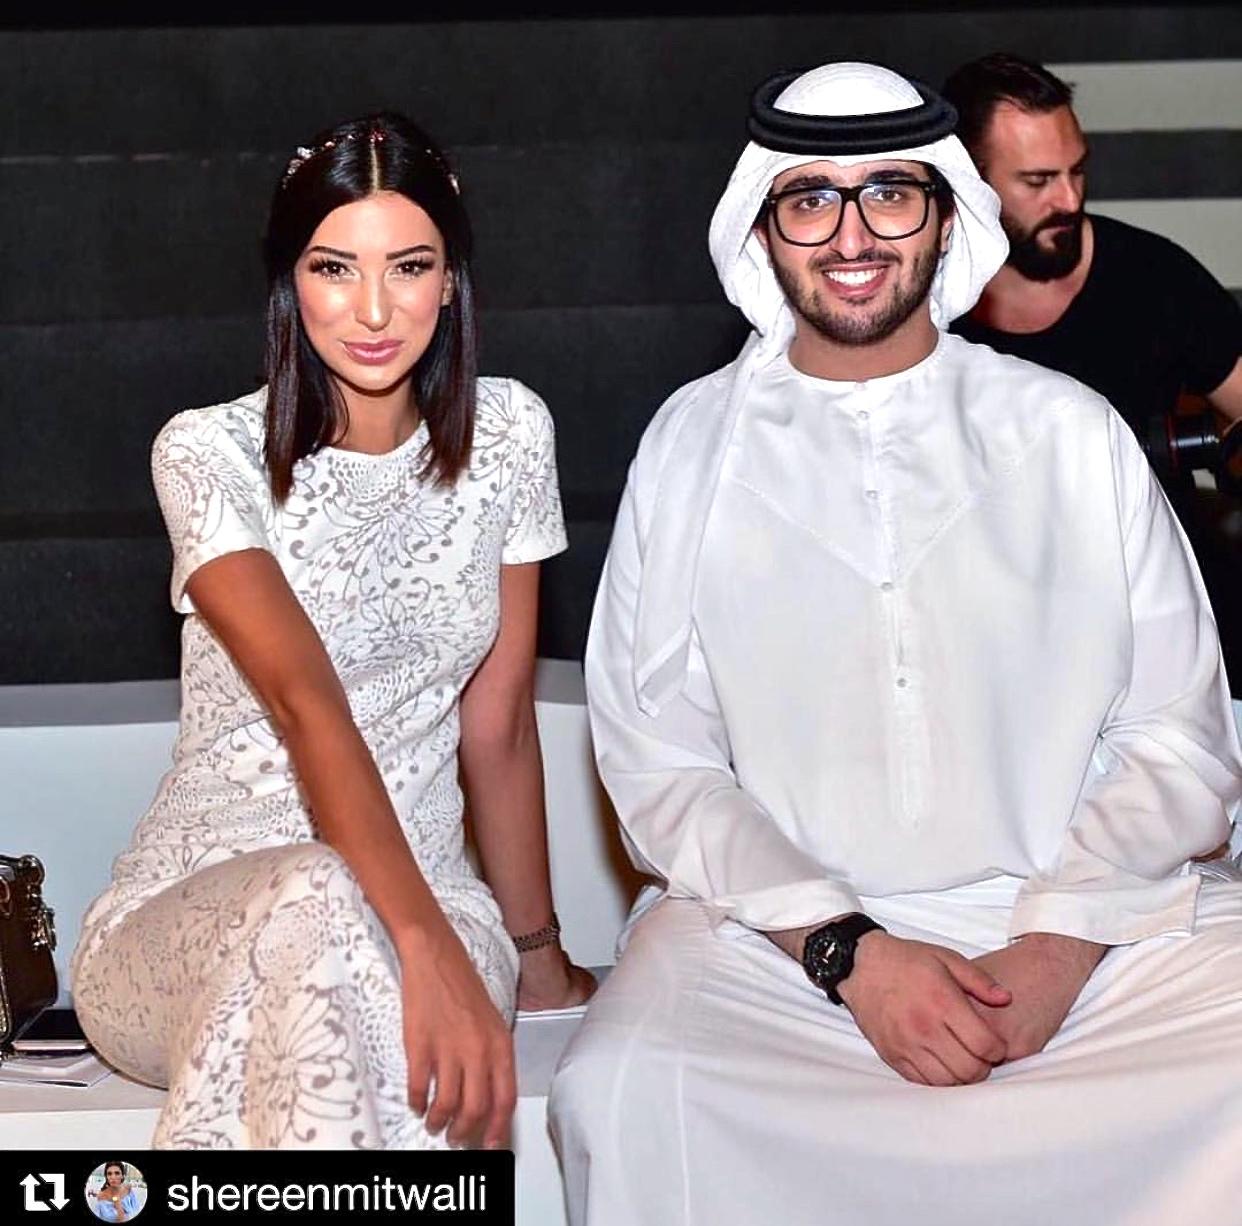 Shereen Mitwalli wearing MILTON-FIRENZE Jewelry Headband Dubai Fashion Week